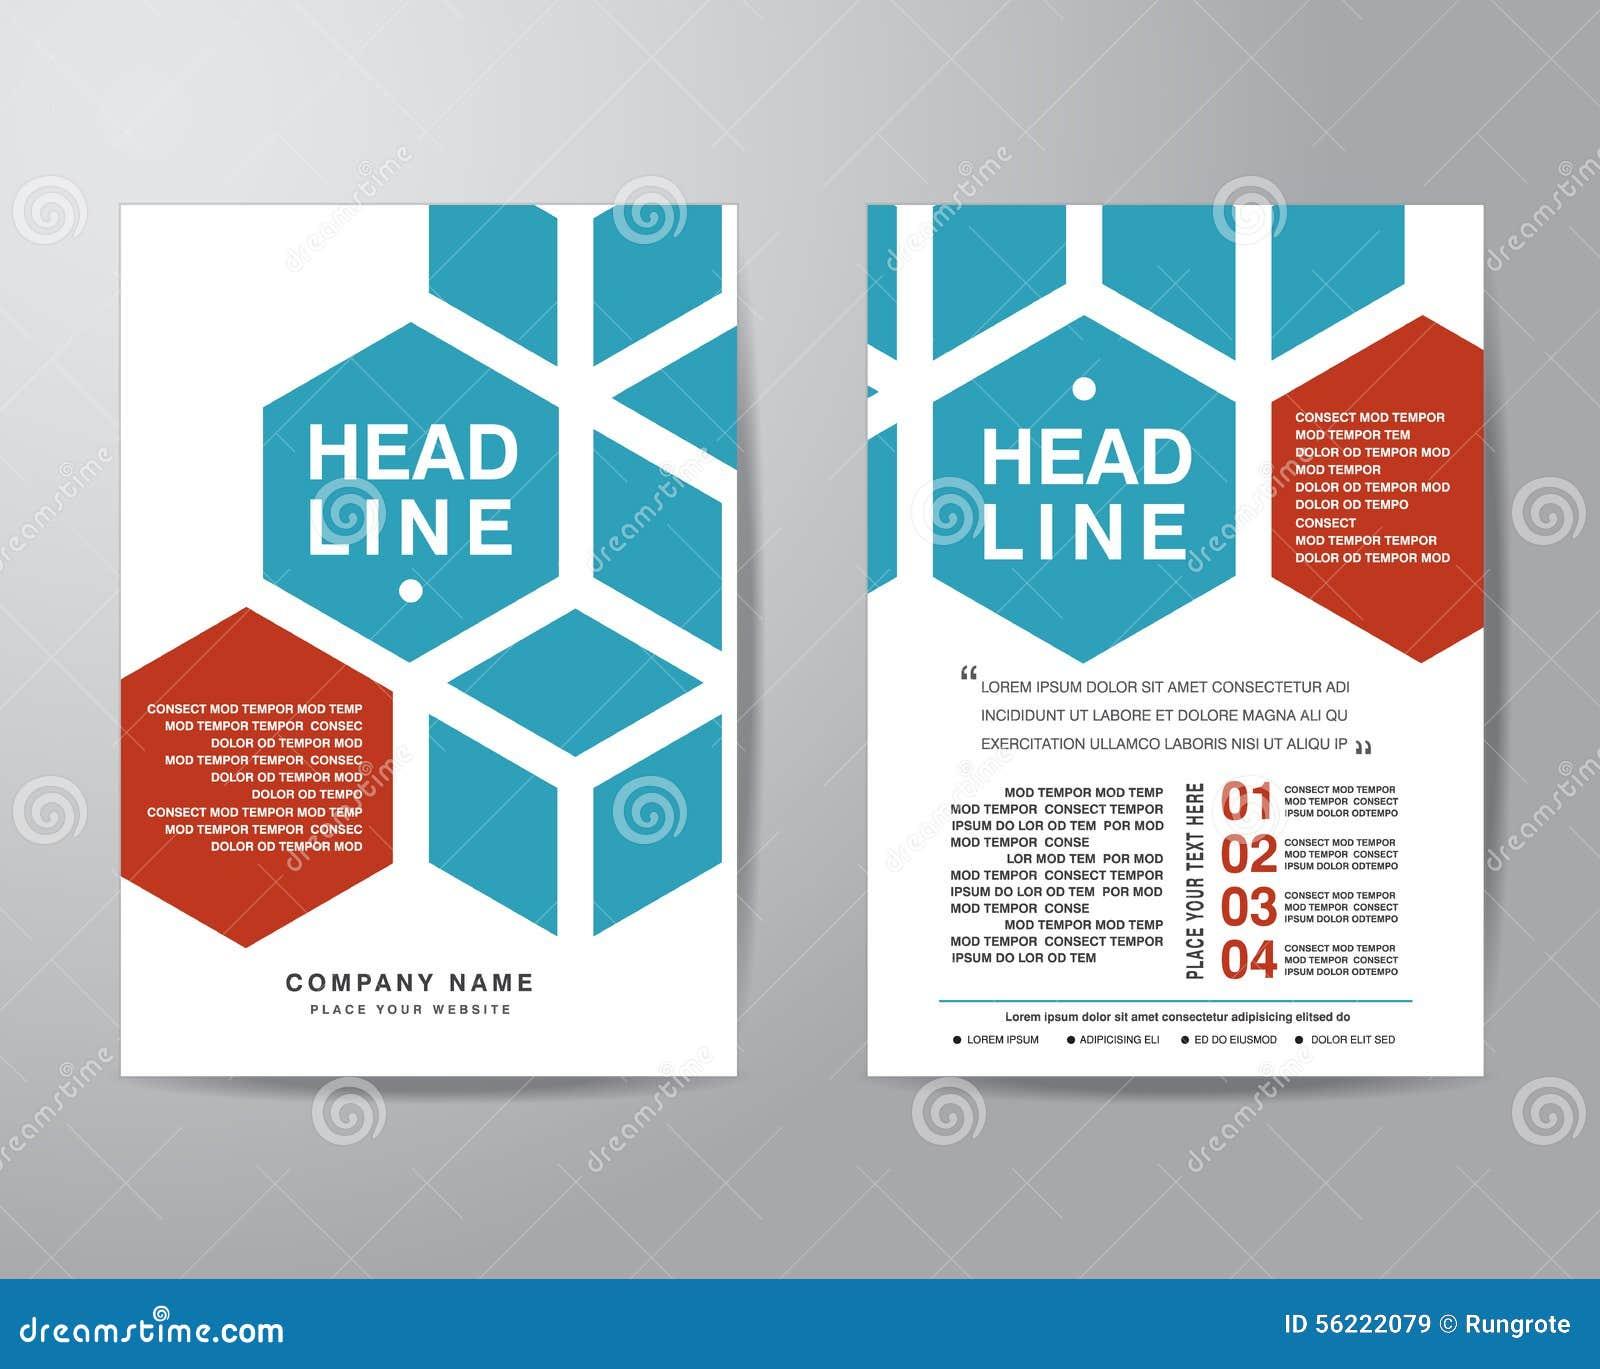 Hexagonal Brochure Flyer Design Layout Template In A4 Size